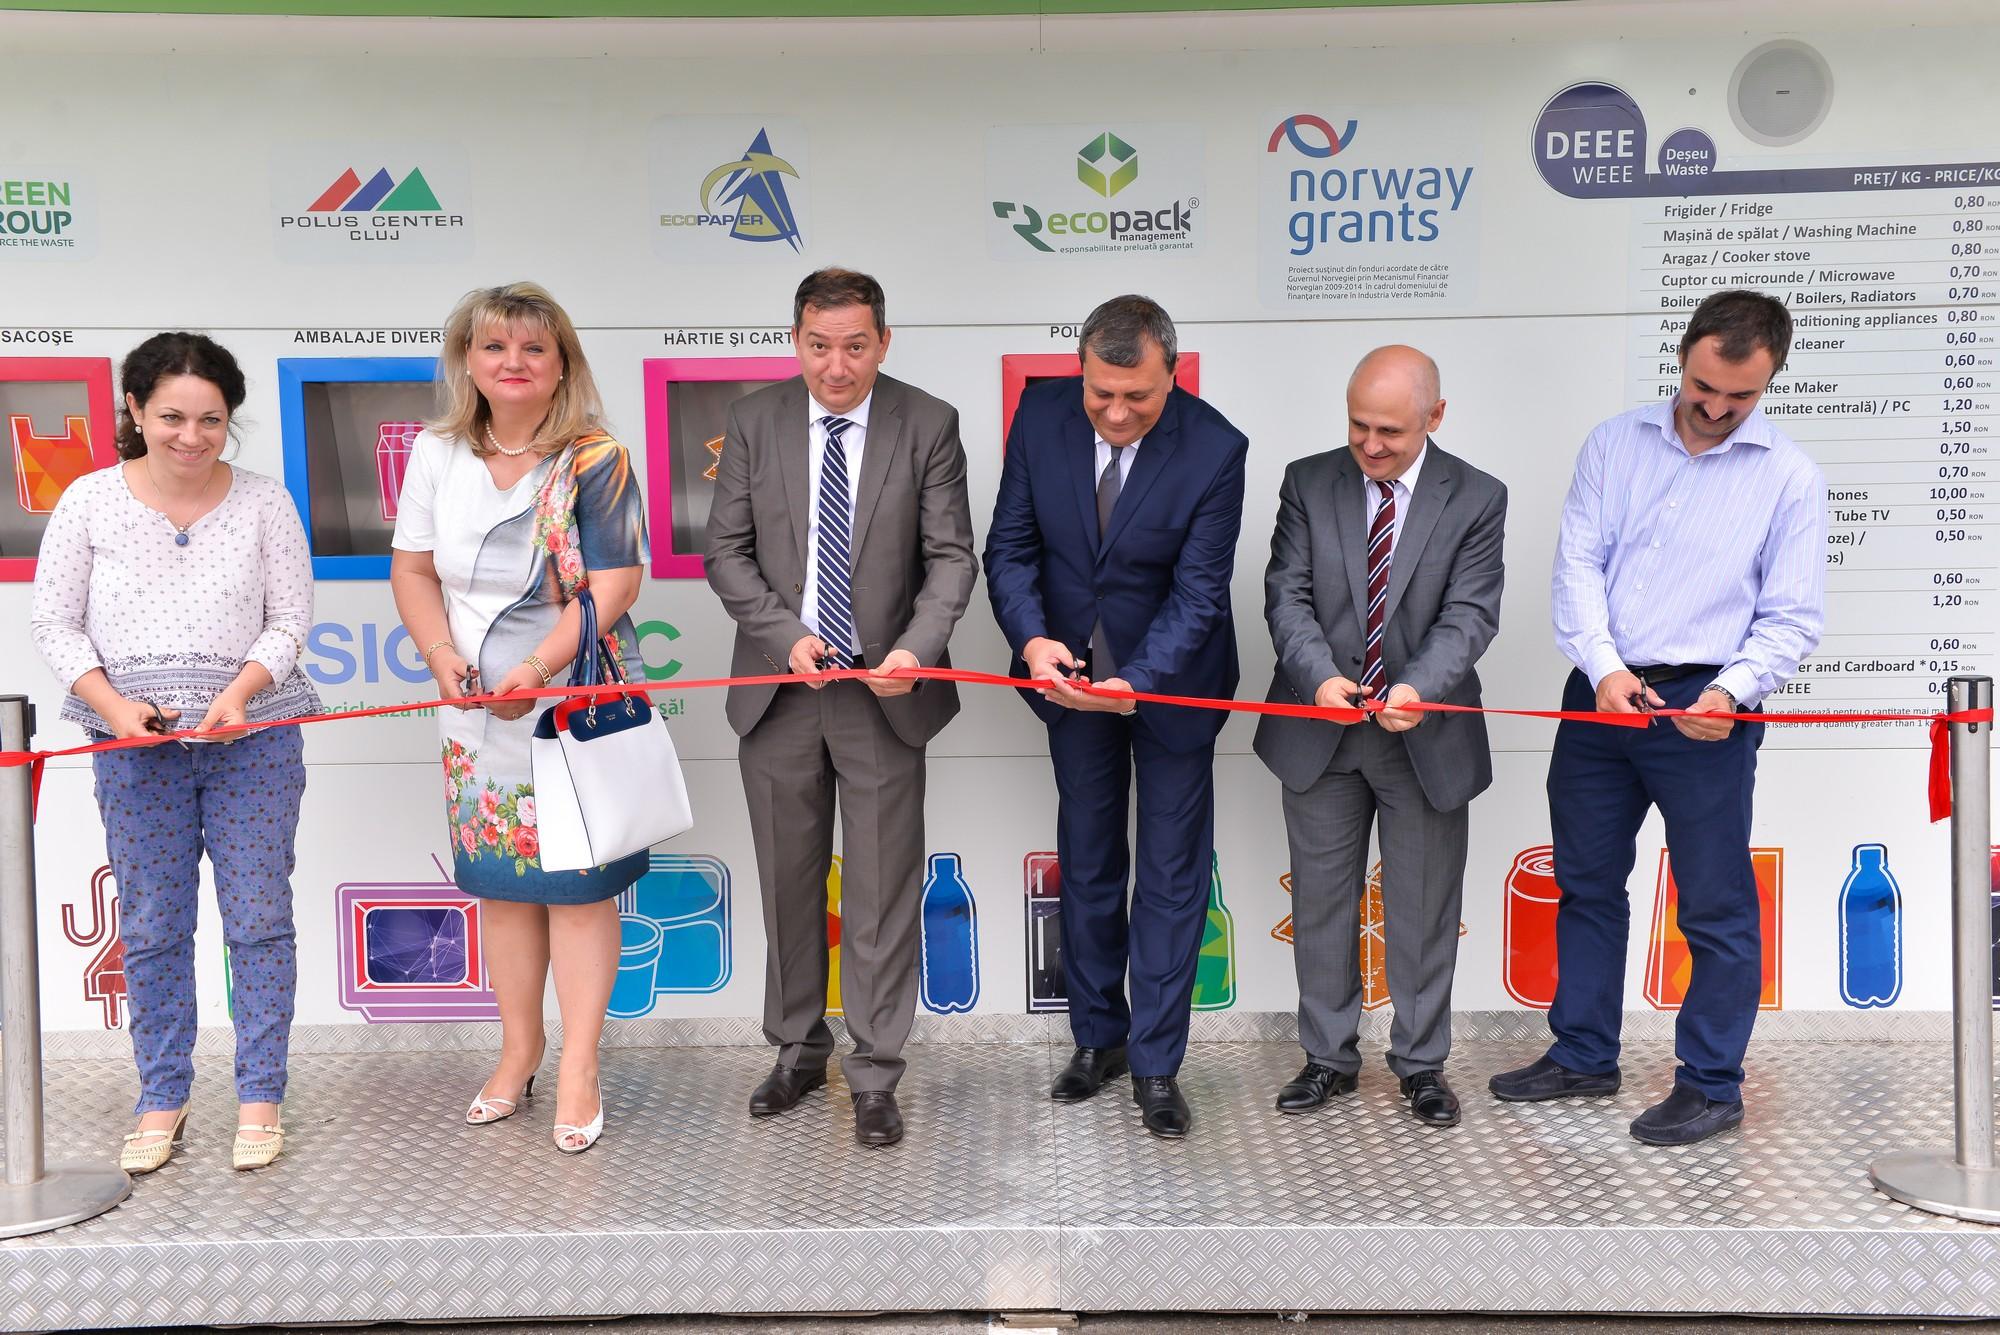 Lansare Statie Sigurec - Cluj - 10.06.2015